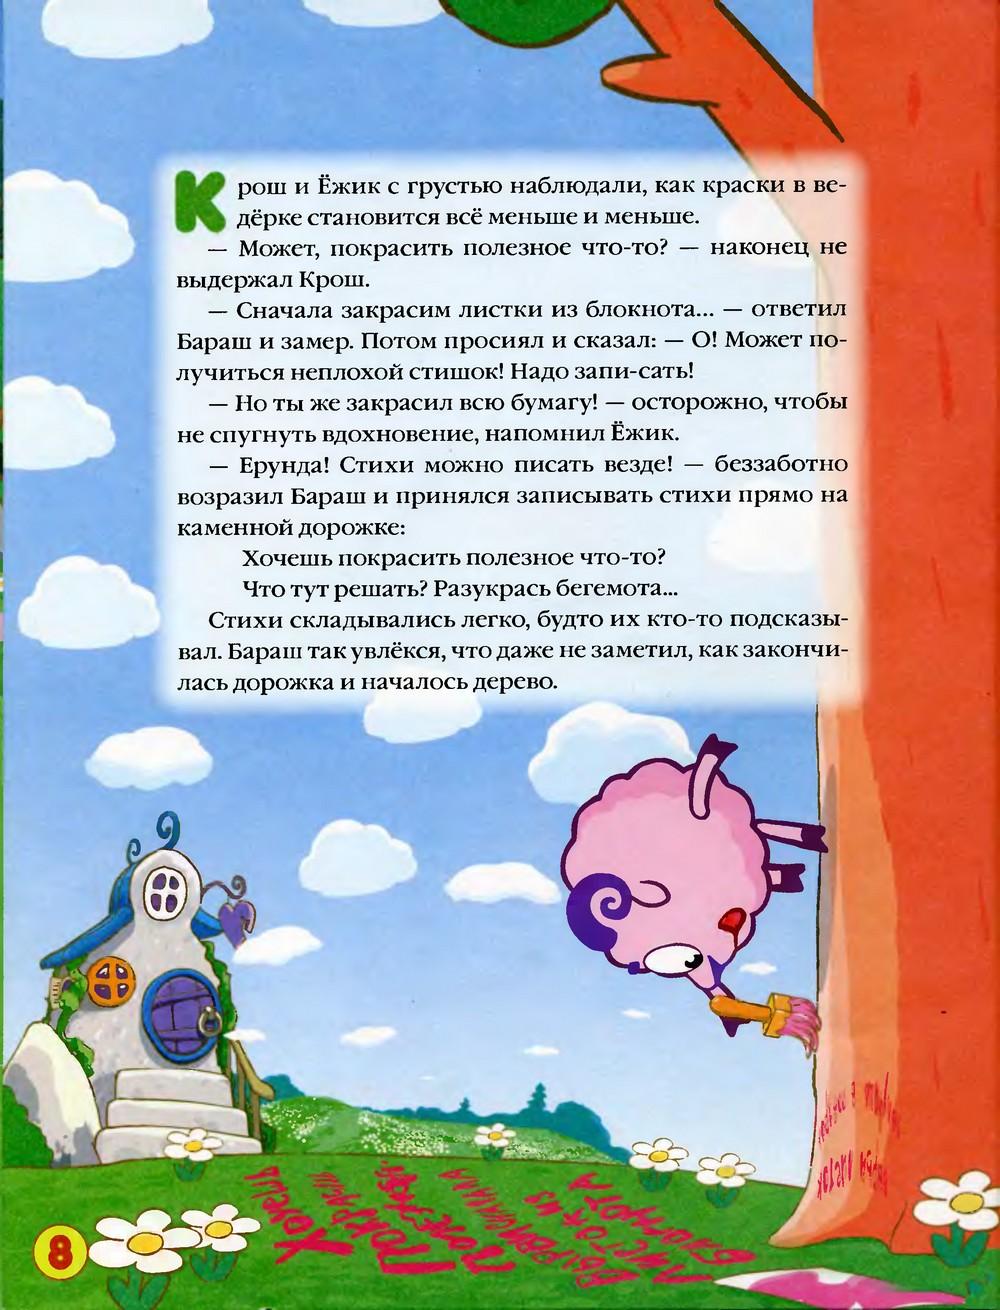 http://i4.imageban.ru/out/2013/11/25/29637bbee16b3ee63058f1558b2098fd.jpg